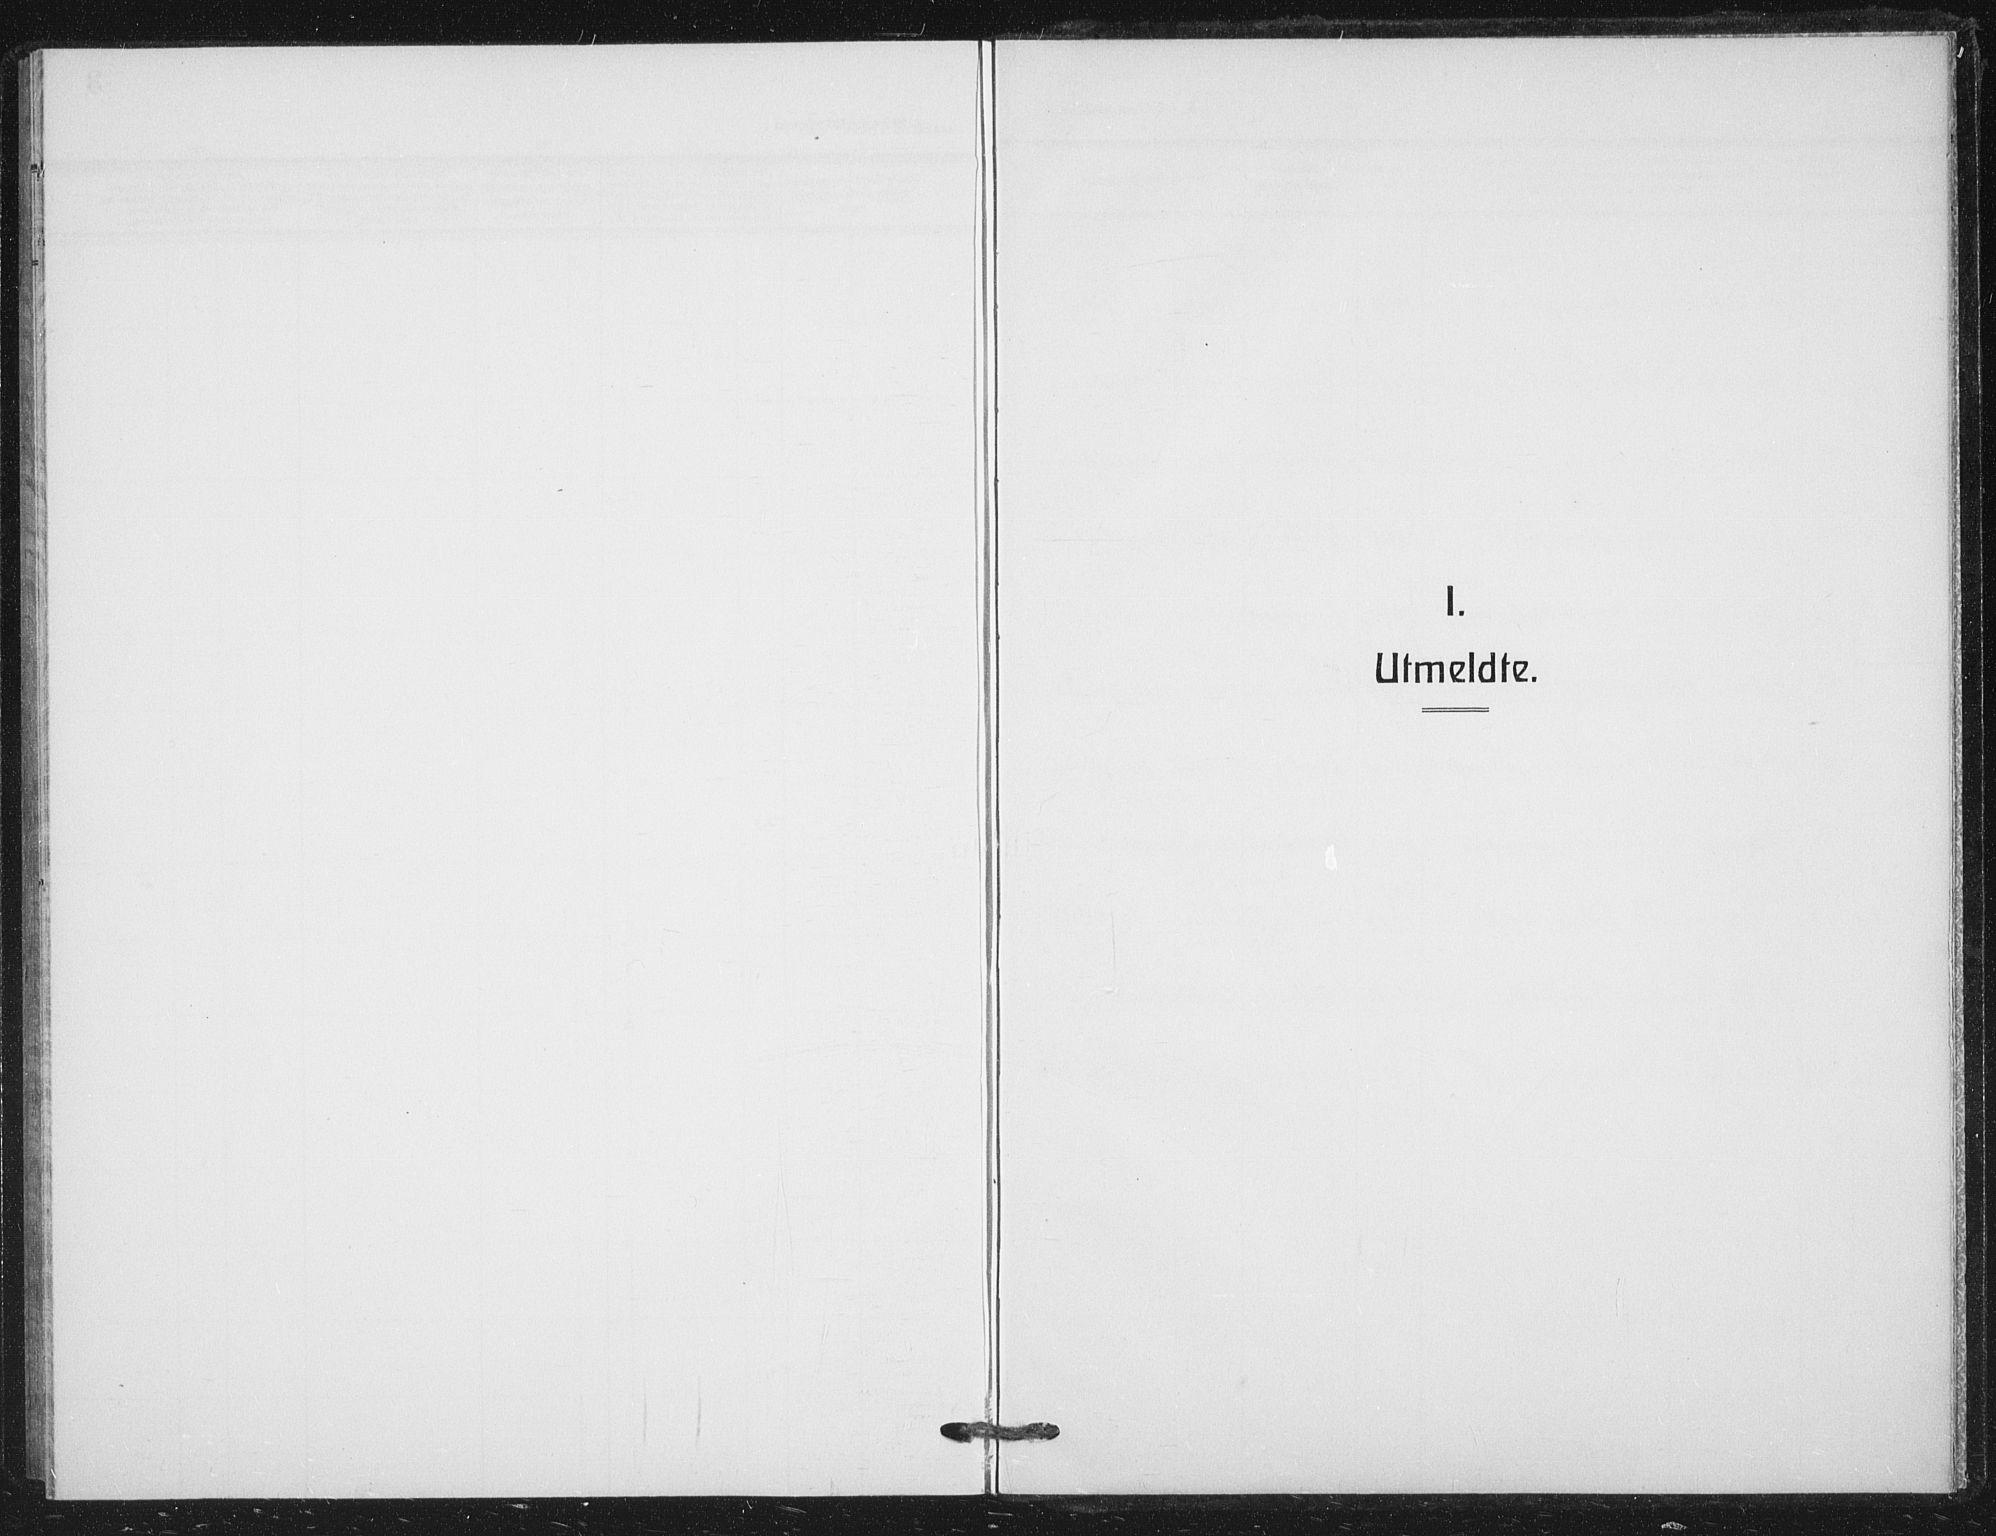 SATØ, Målselv sokneprestembete, G/Ga/Gab/L0012klokker: Klokkerbok nr. 12, 1900-1936